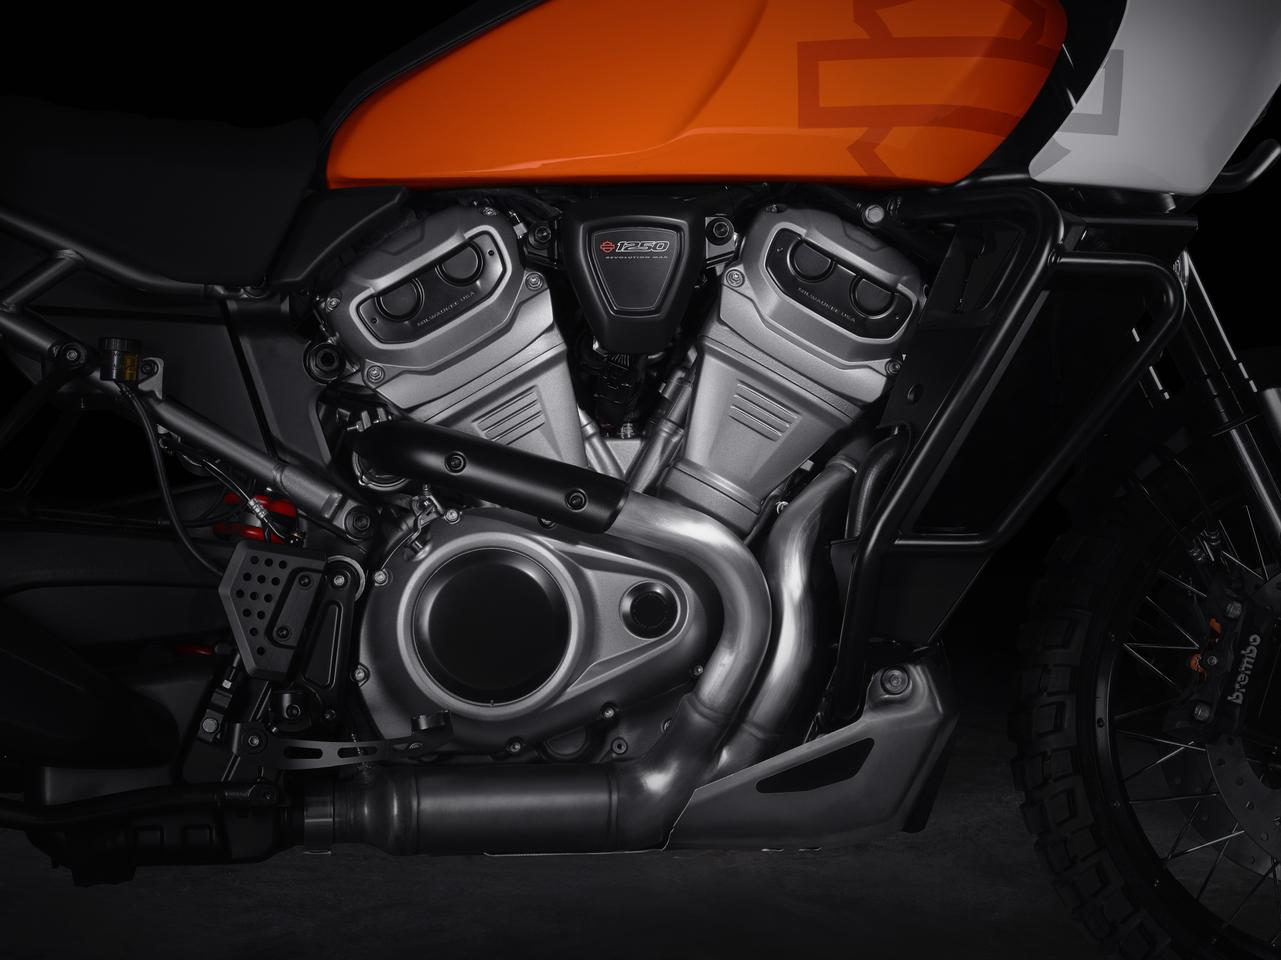 The 1250cc Revolution Max engine